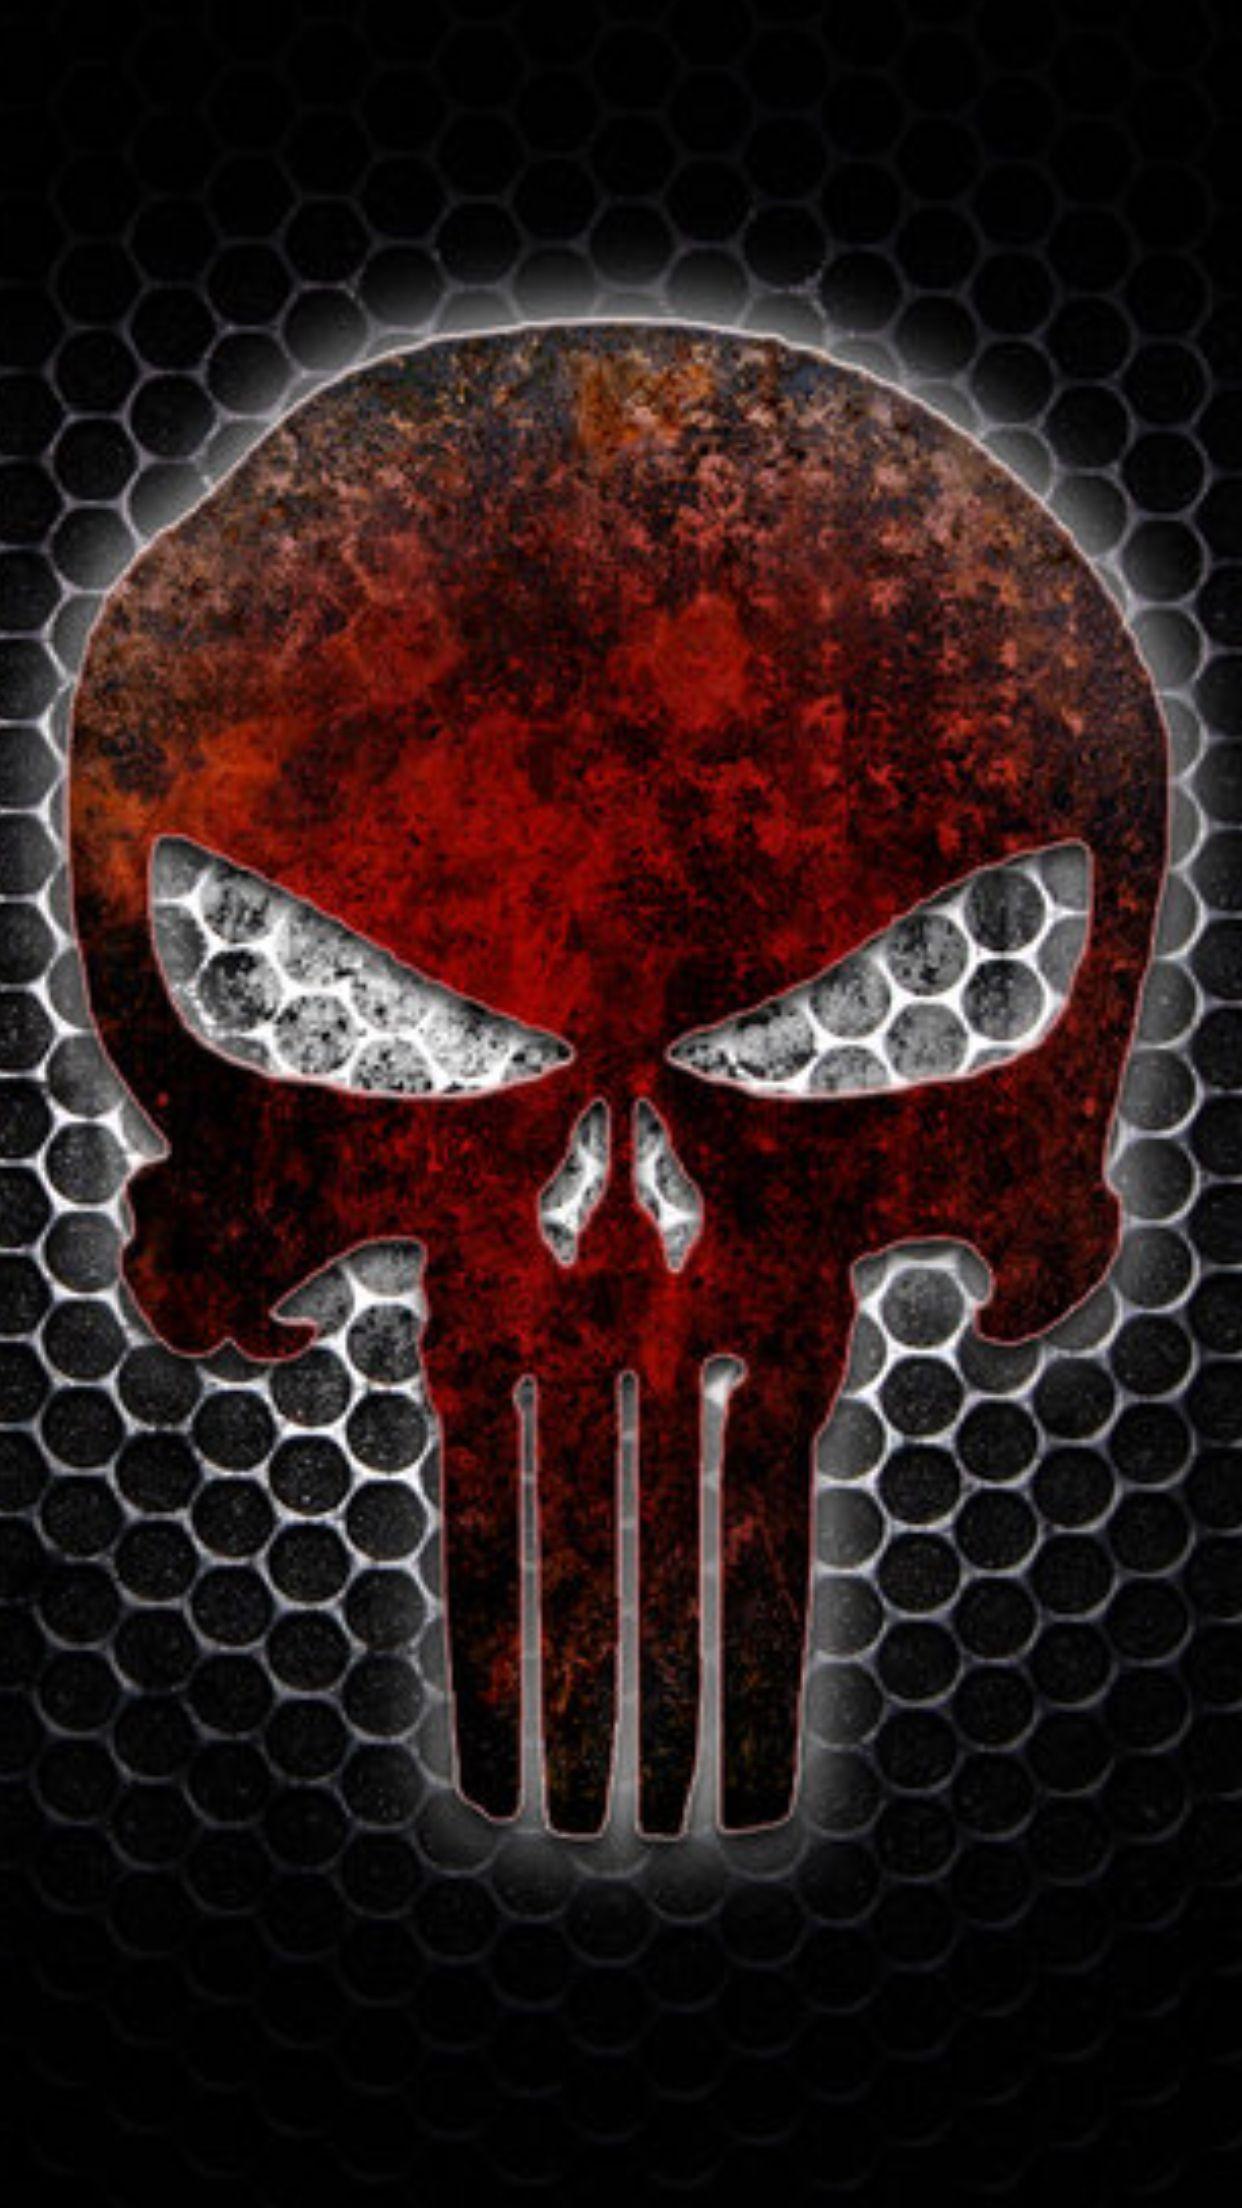 Punisher Punisher skull, Punisher art, Punisher logo